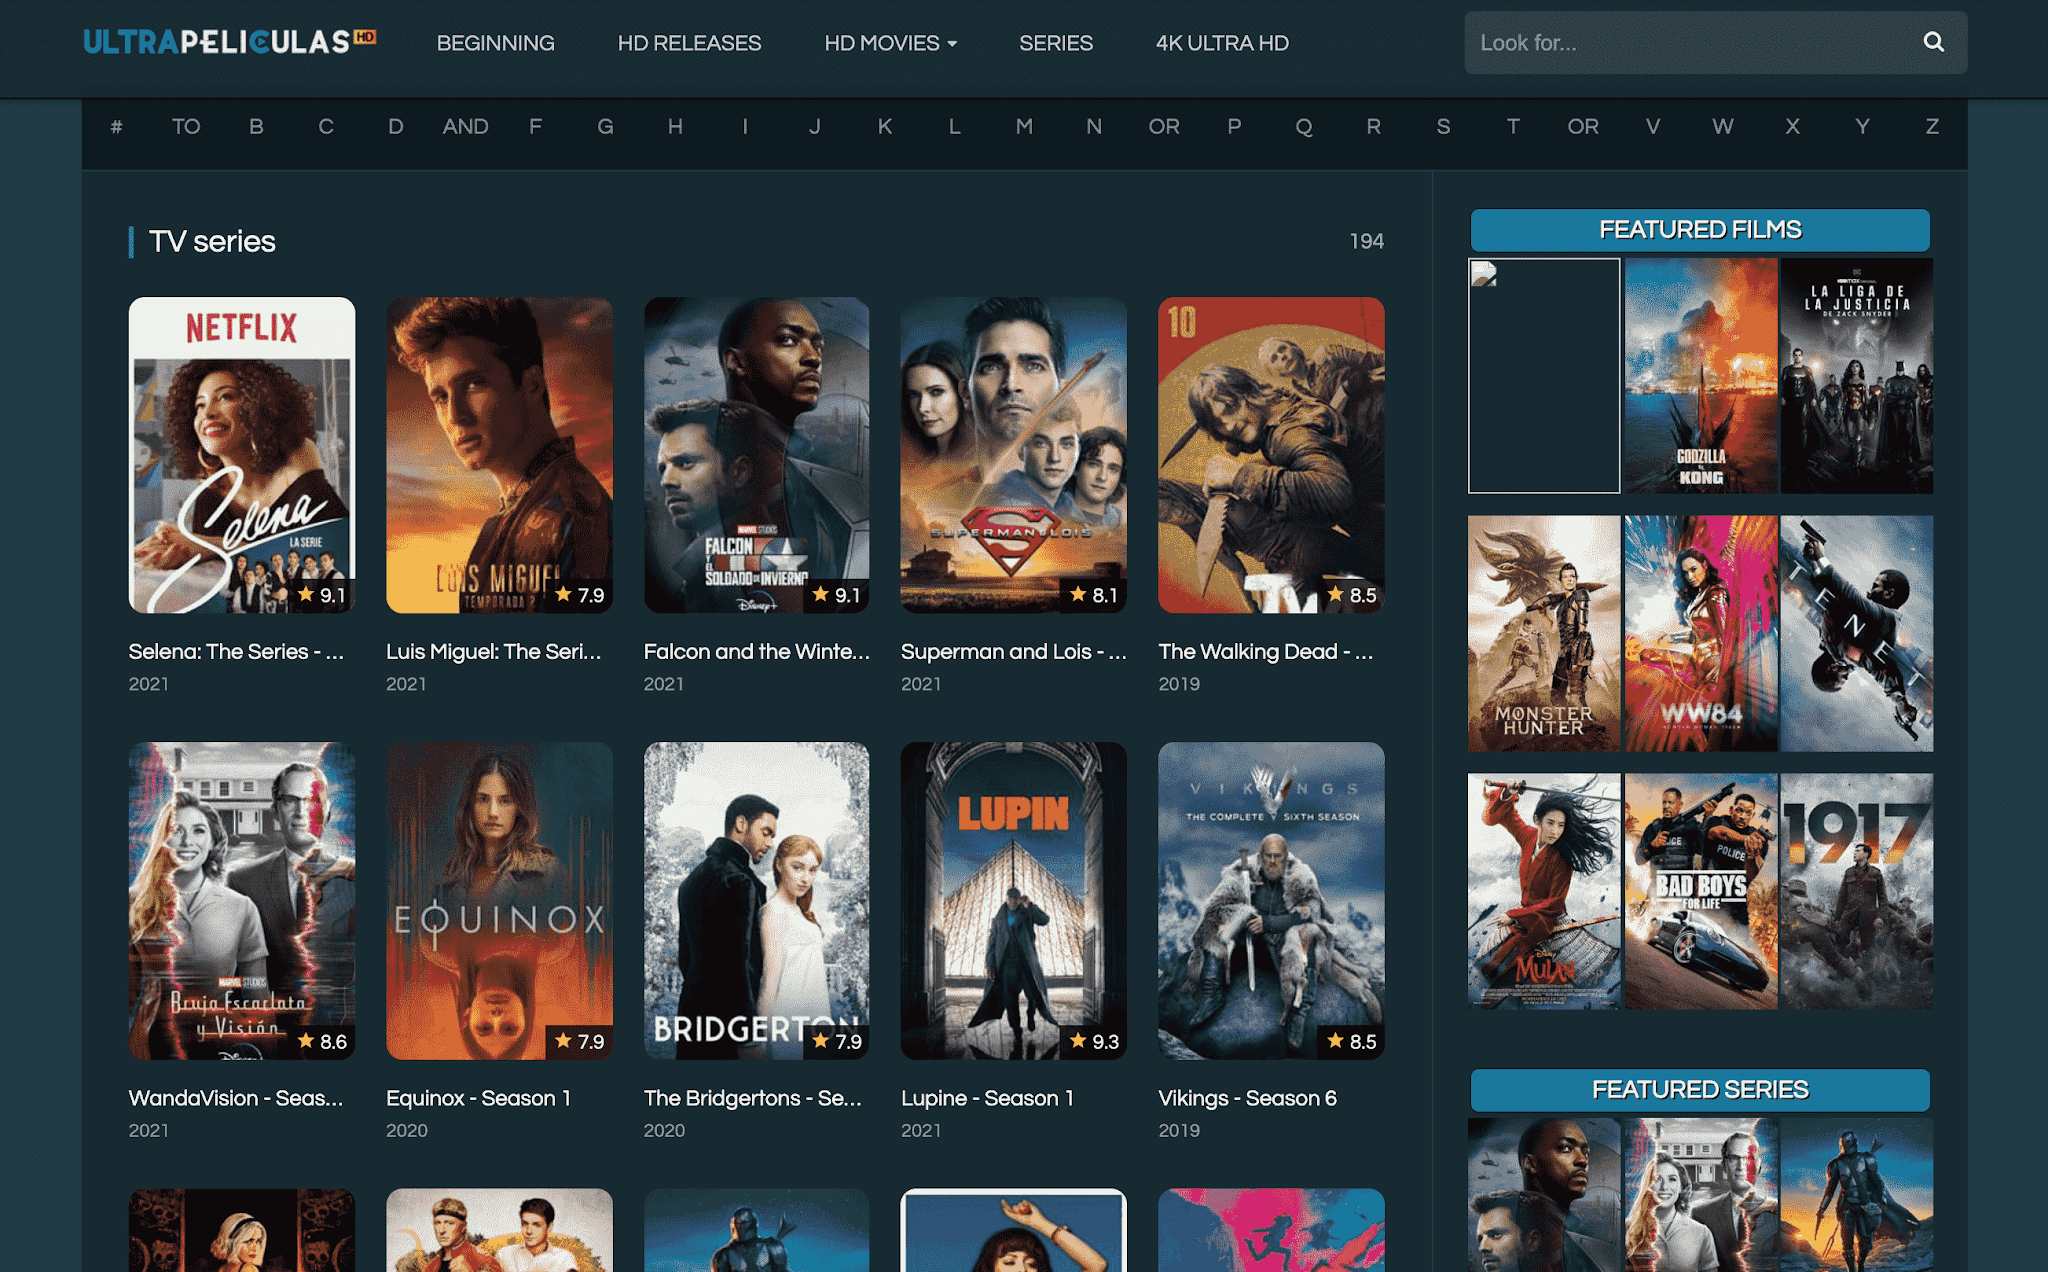 Watch Movies & Series Online on Ultrapeliculashd.com